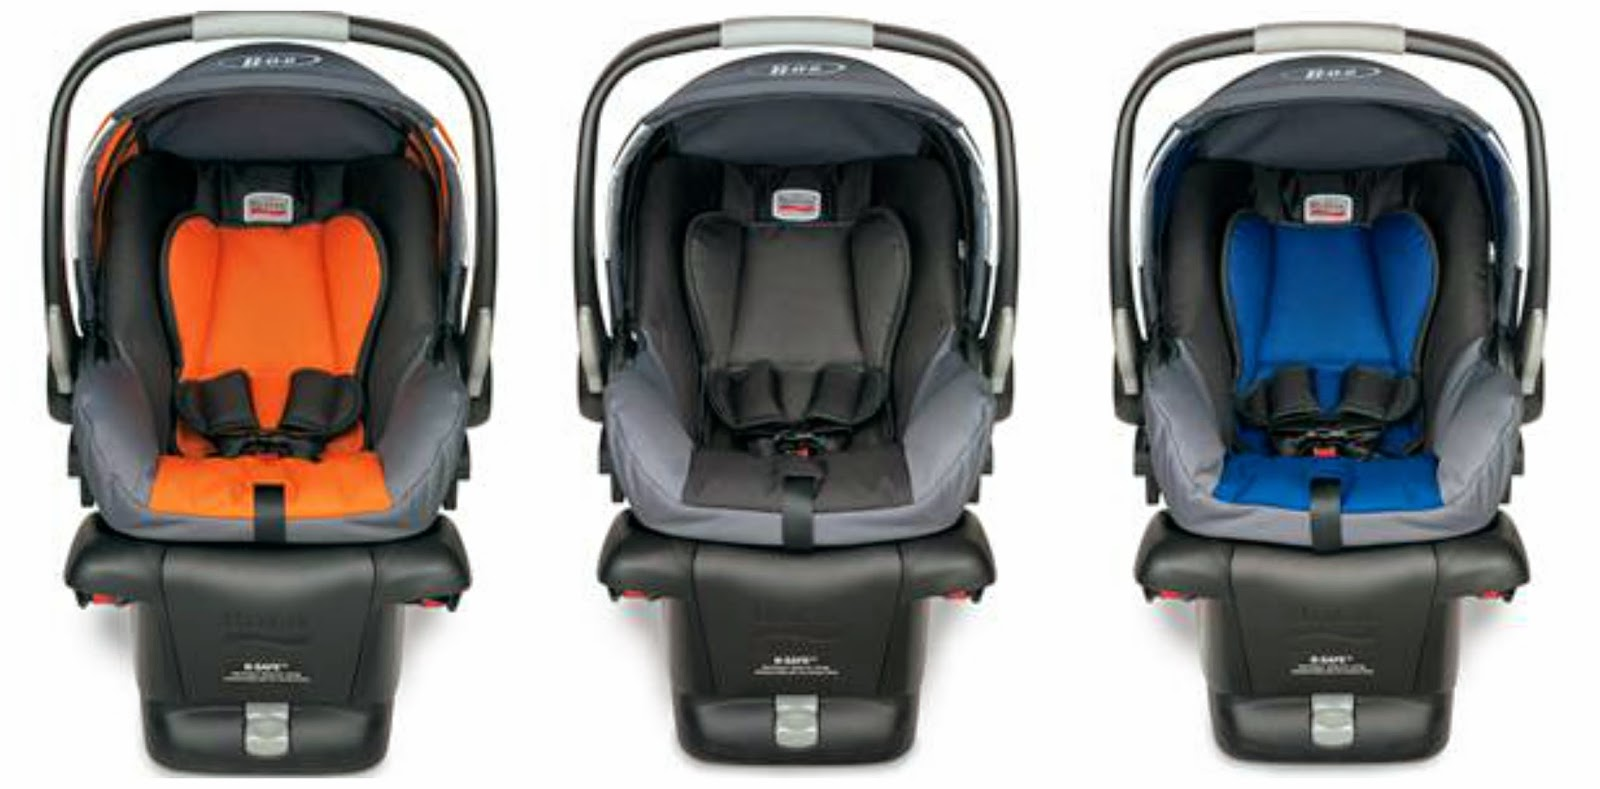 The Quick Journey Britax Bob B Safe Car Seat Review